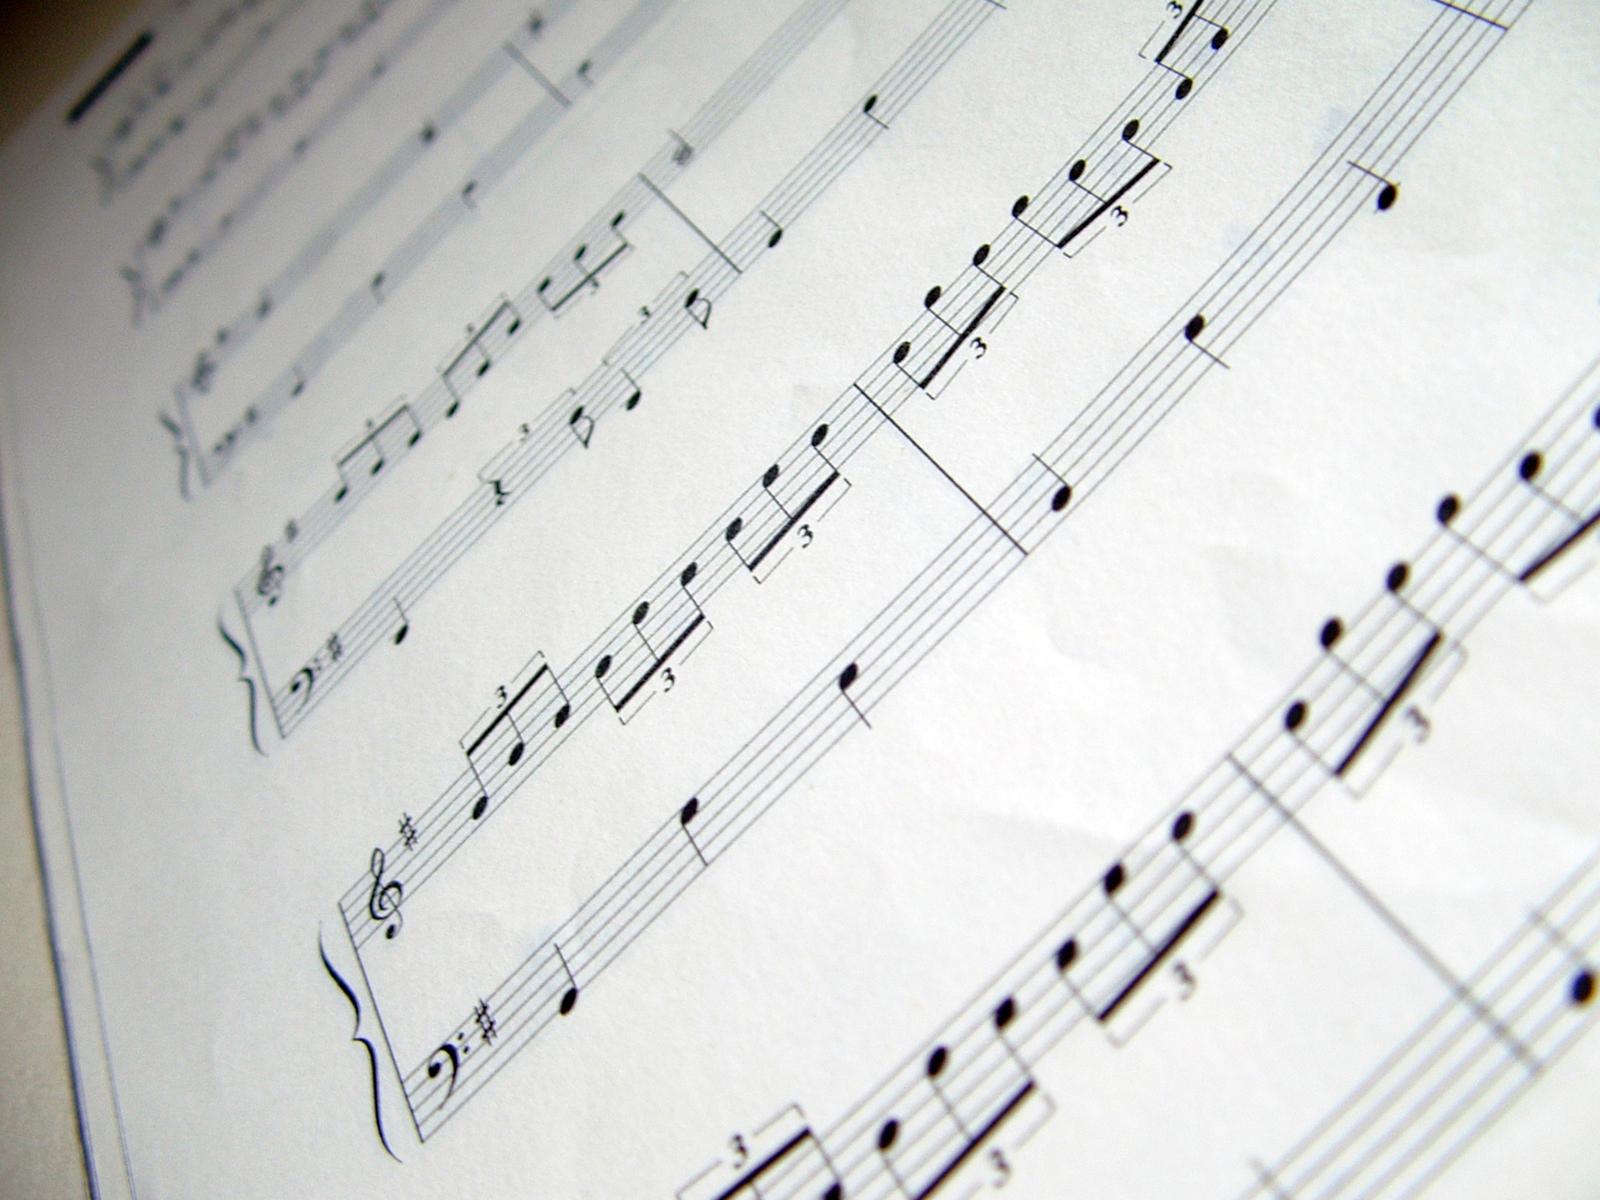 music-sheet-4-1558172-1600x1200.jpg